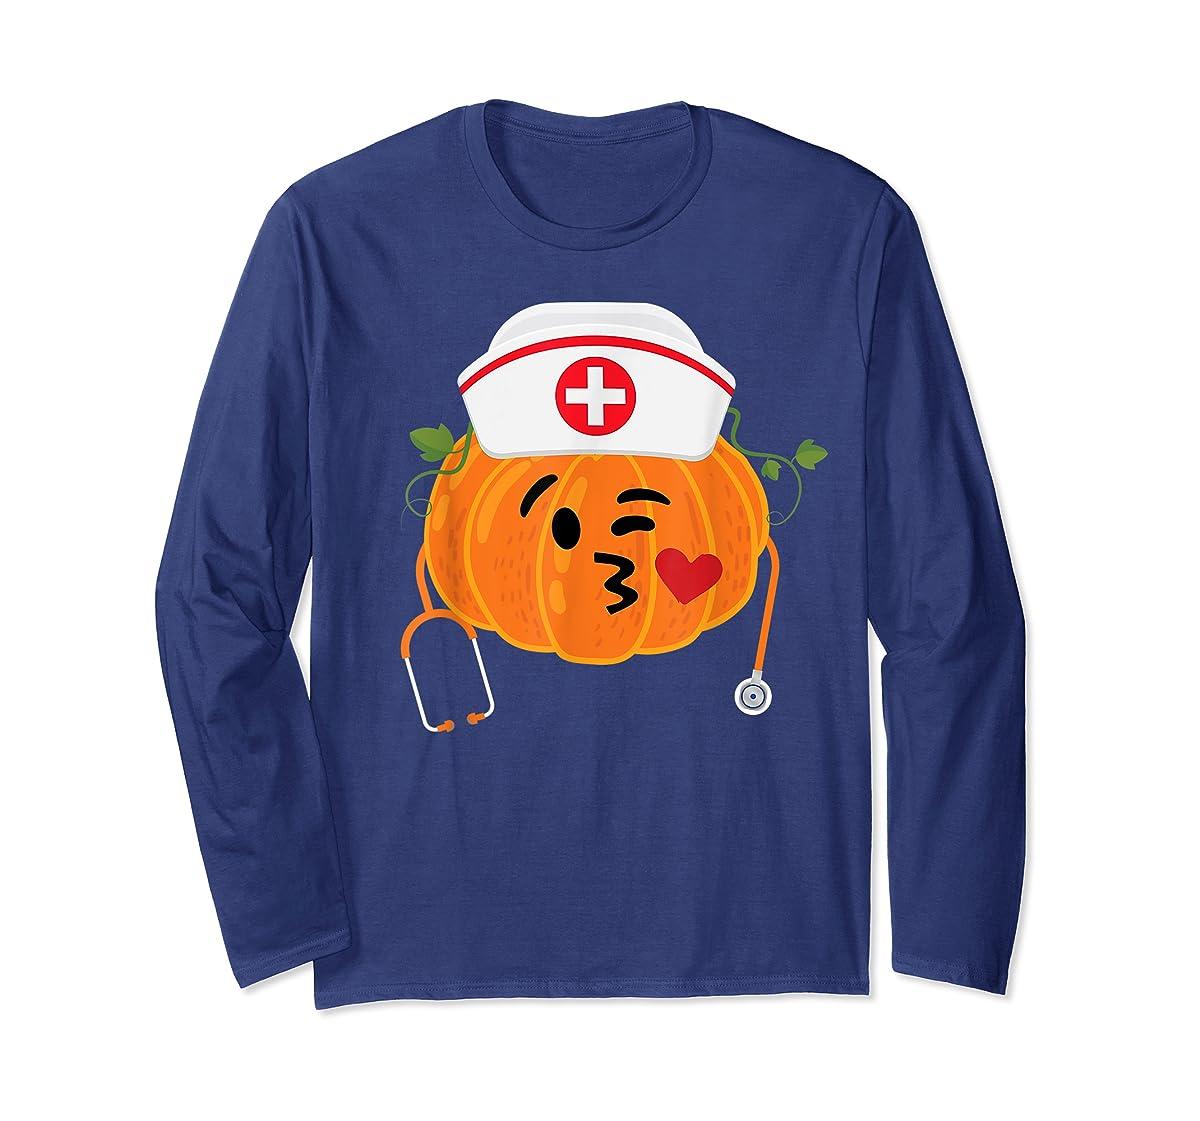 Nurse Stethoscope Pumpkin Funny Nursing Halloween Gift T-Shirt-Long Sleeve-Navy